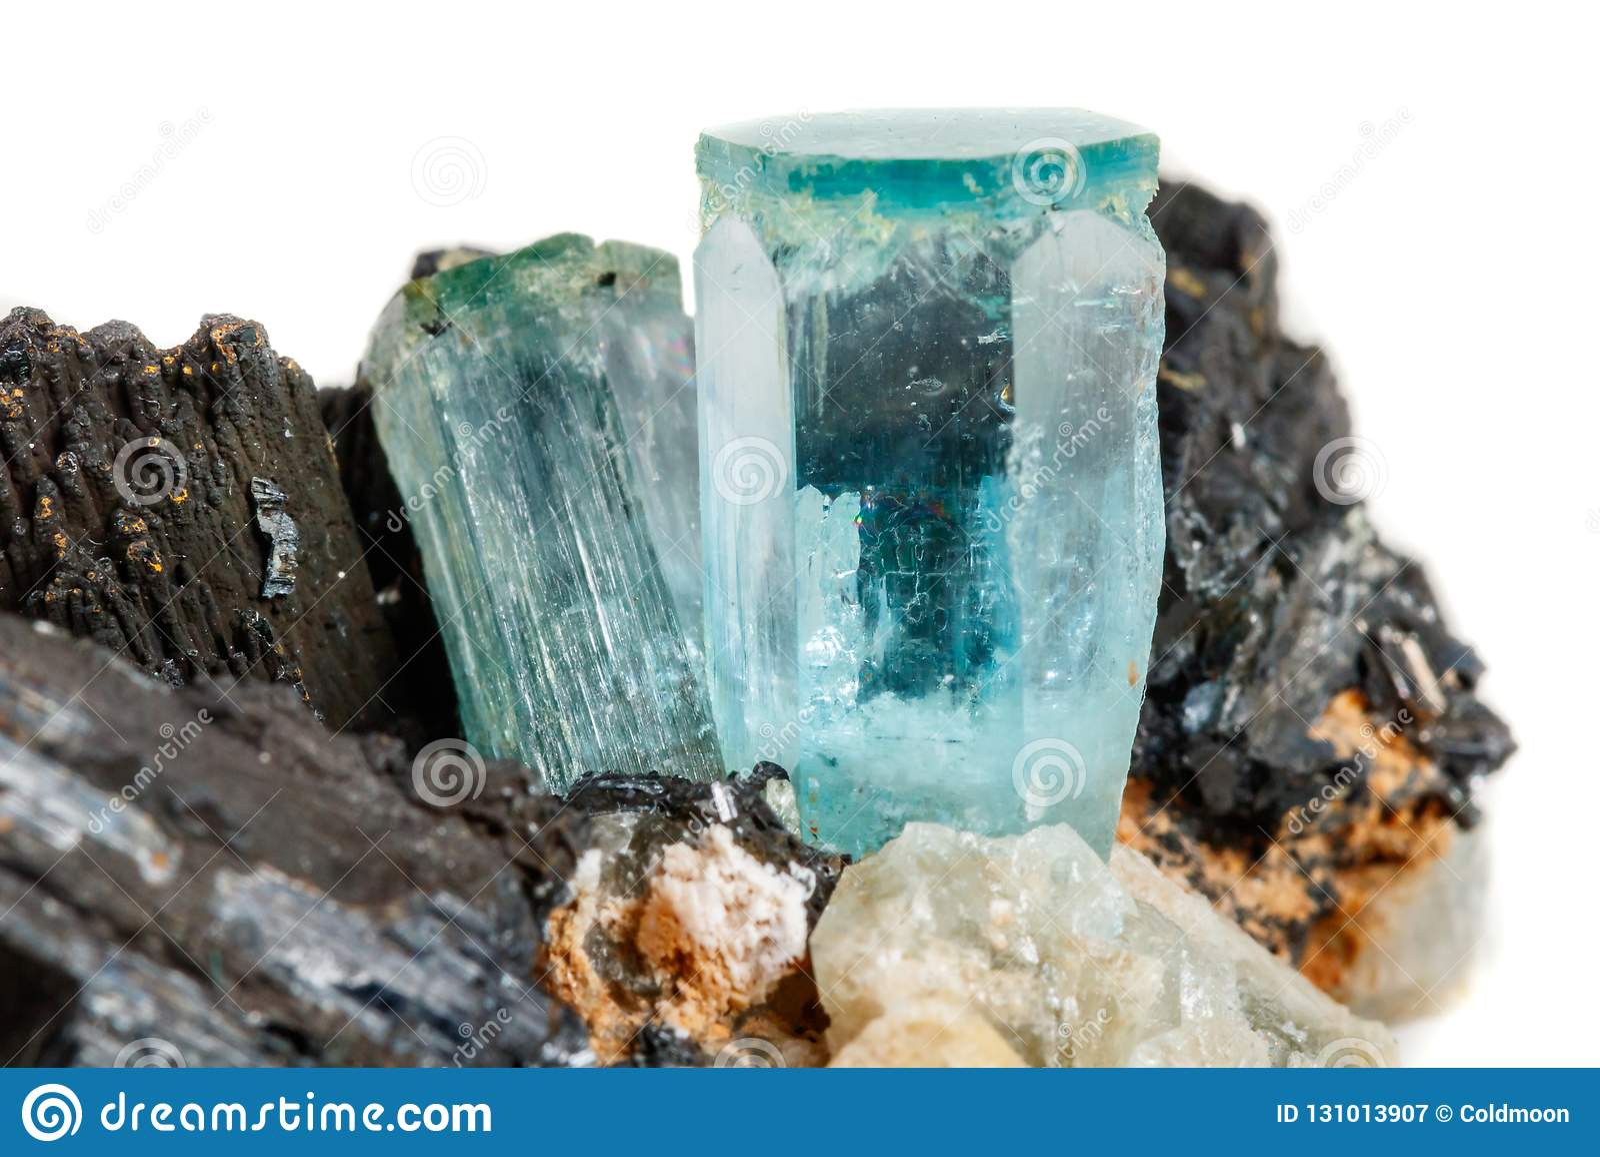 Macro mineral stone Aquamarine and black tourmaline, Schorl on a